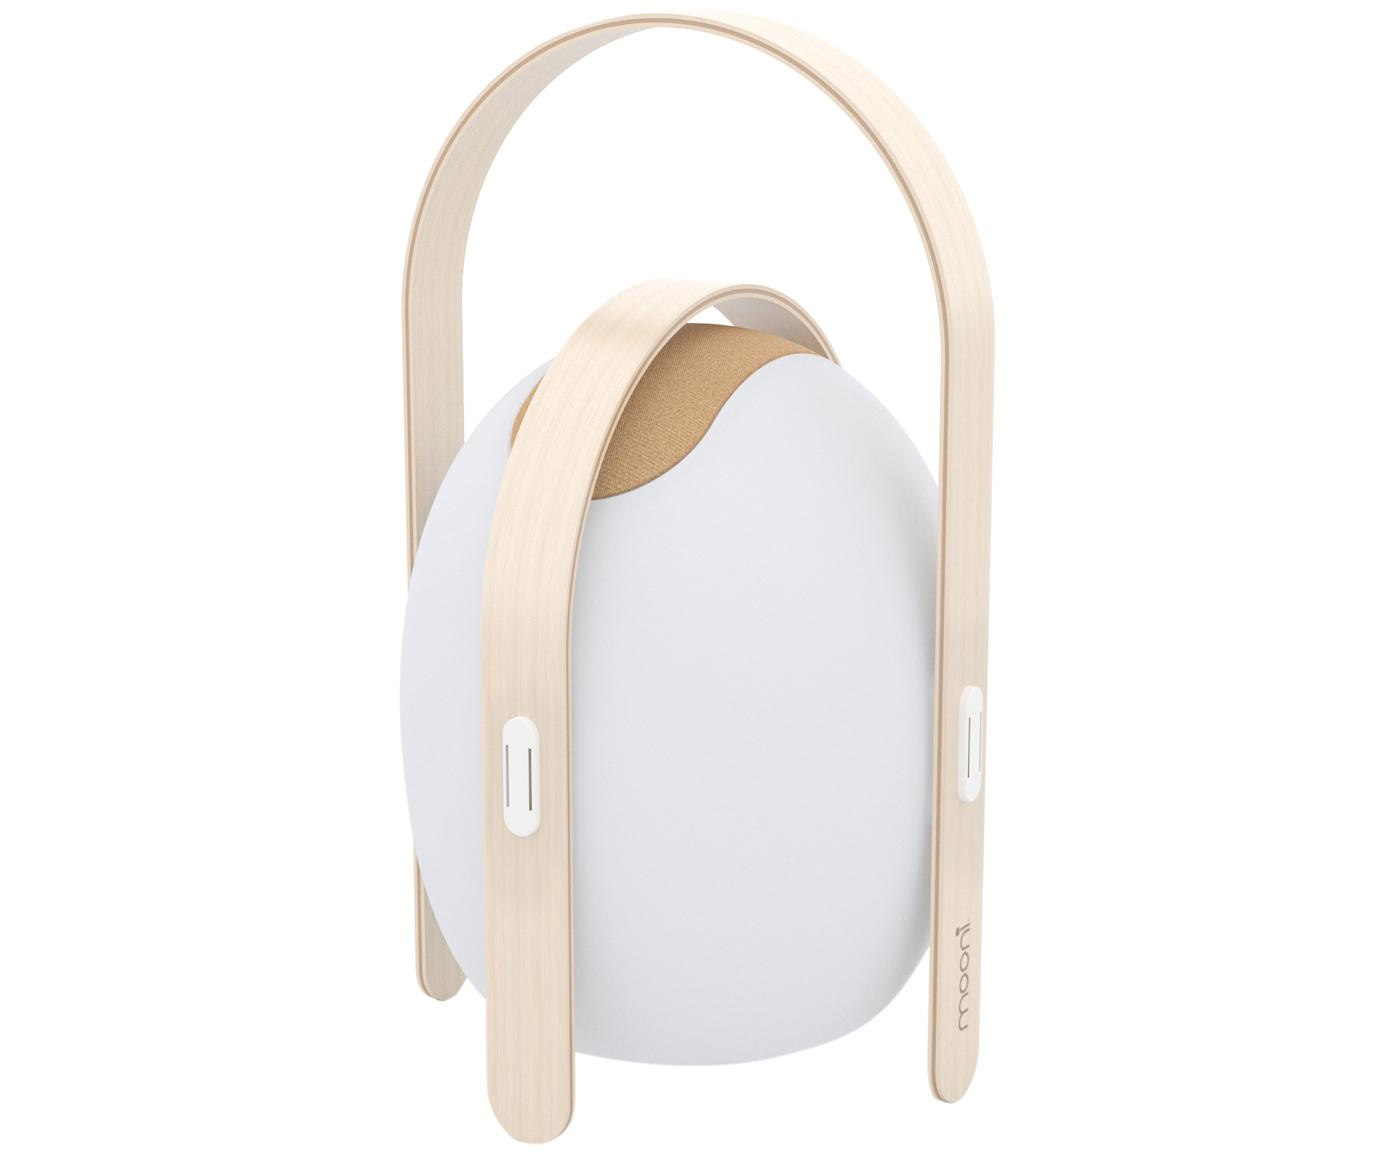 Mobiele outdoor LED lamp met luidspreker Ovo, Lampenkap: kunststof (LDPE), Frame: olmenhout met berkenhoutf, Wit, lichtbruin, Ø 32 x H 50 cm